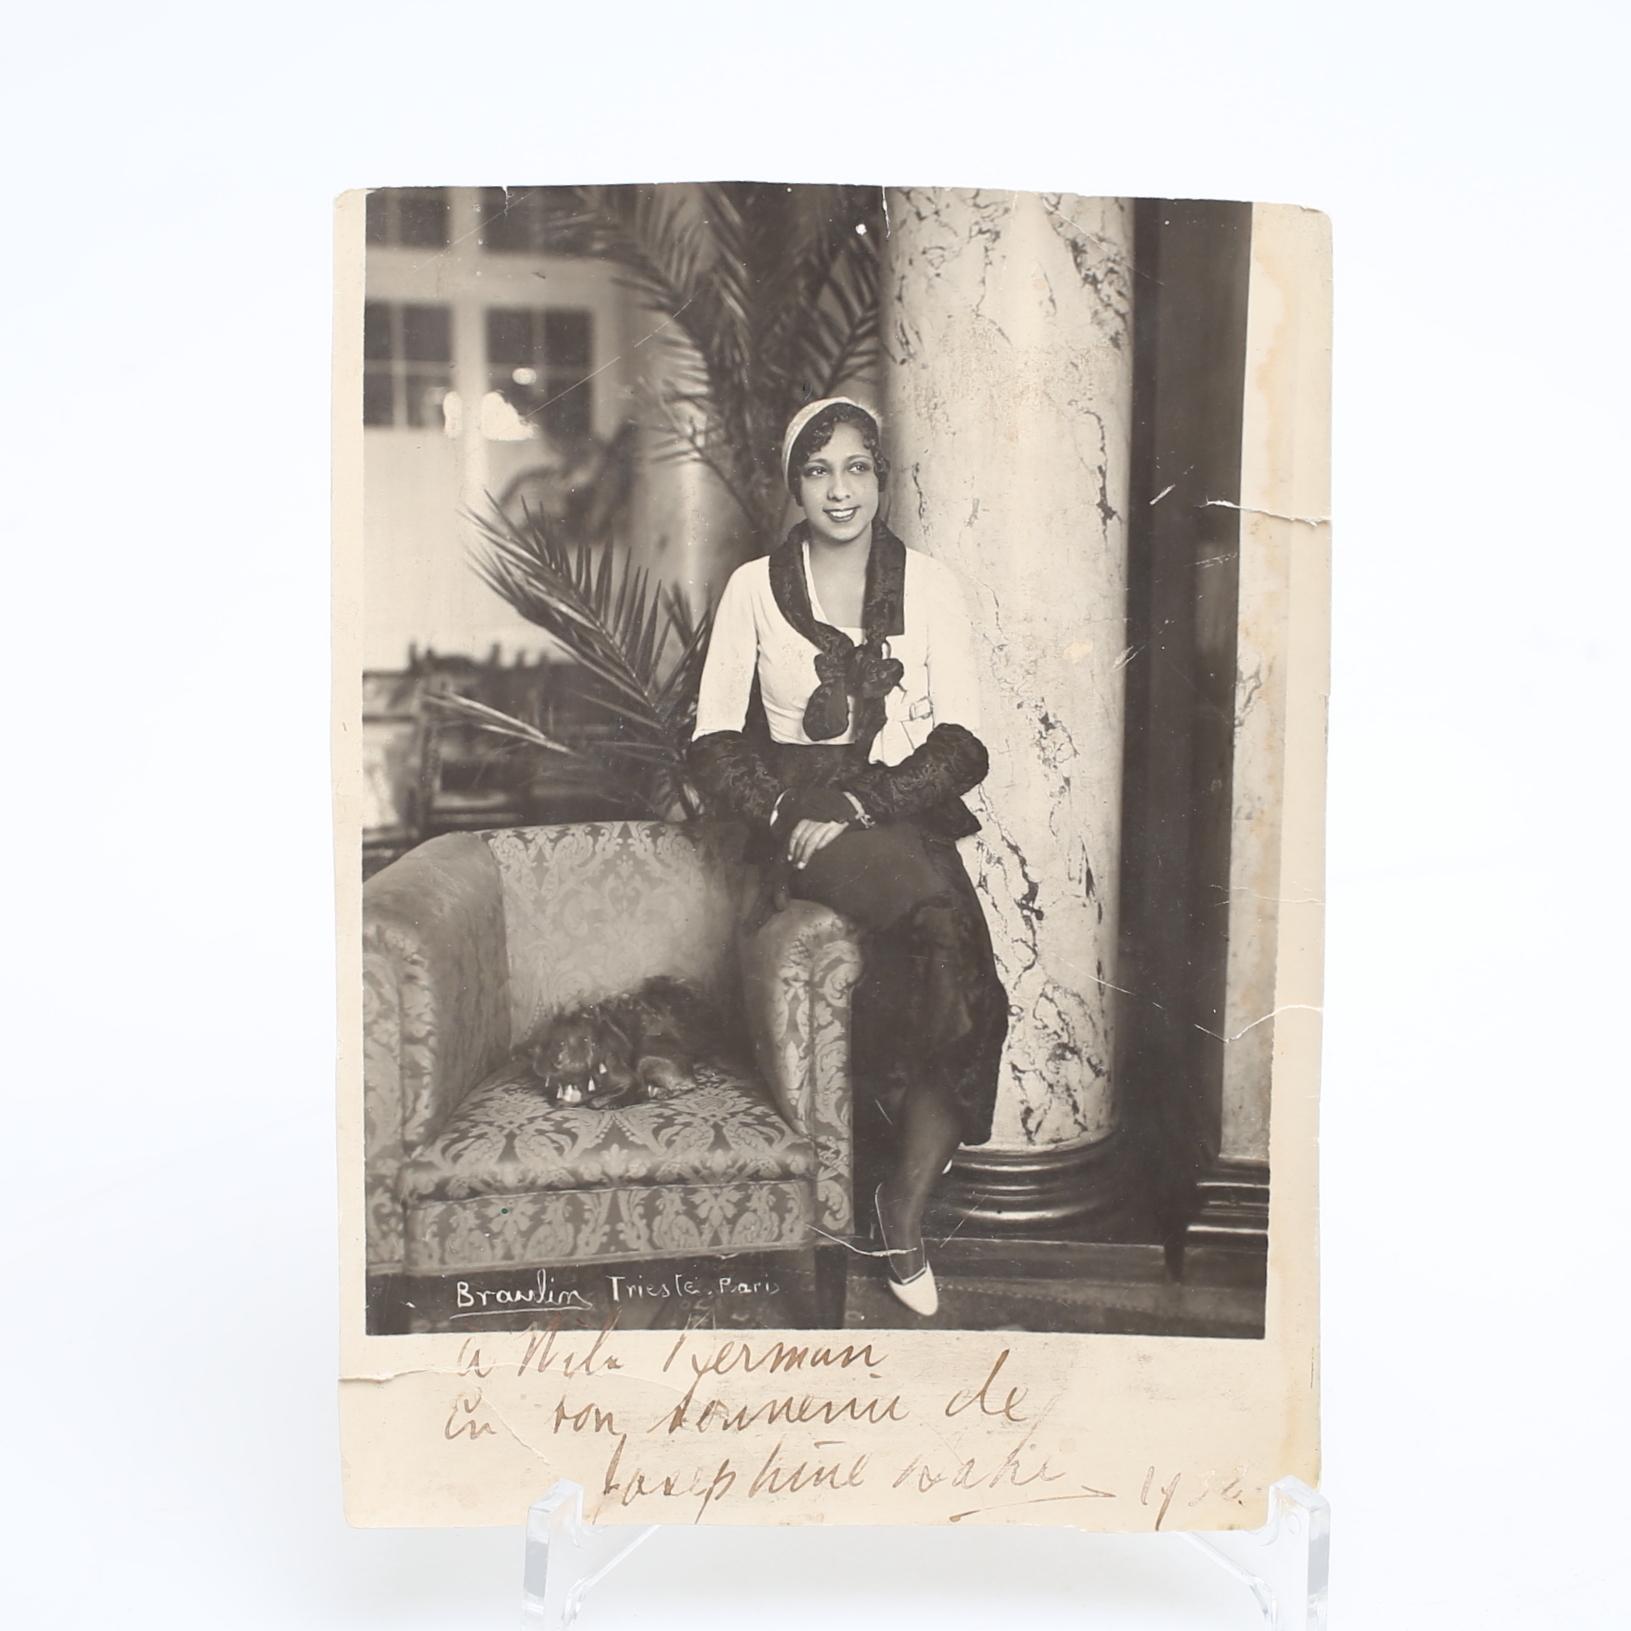 Kort Fotografi Paris Tidigt 1900 Tal Art Photography Auctionet